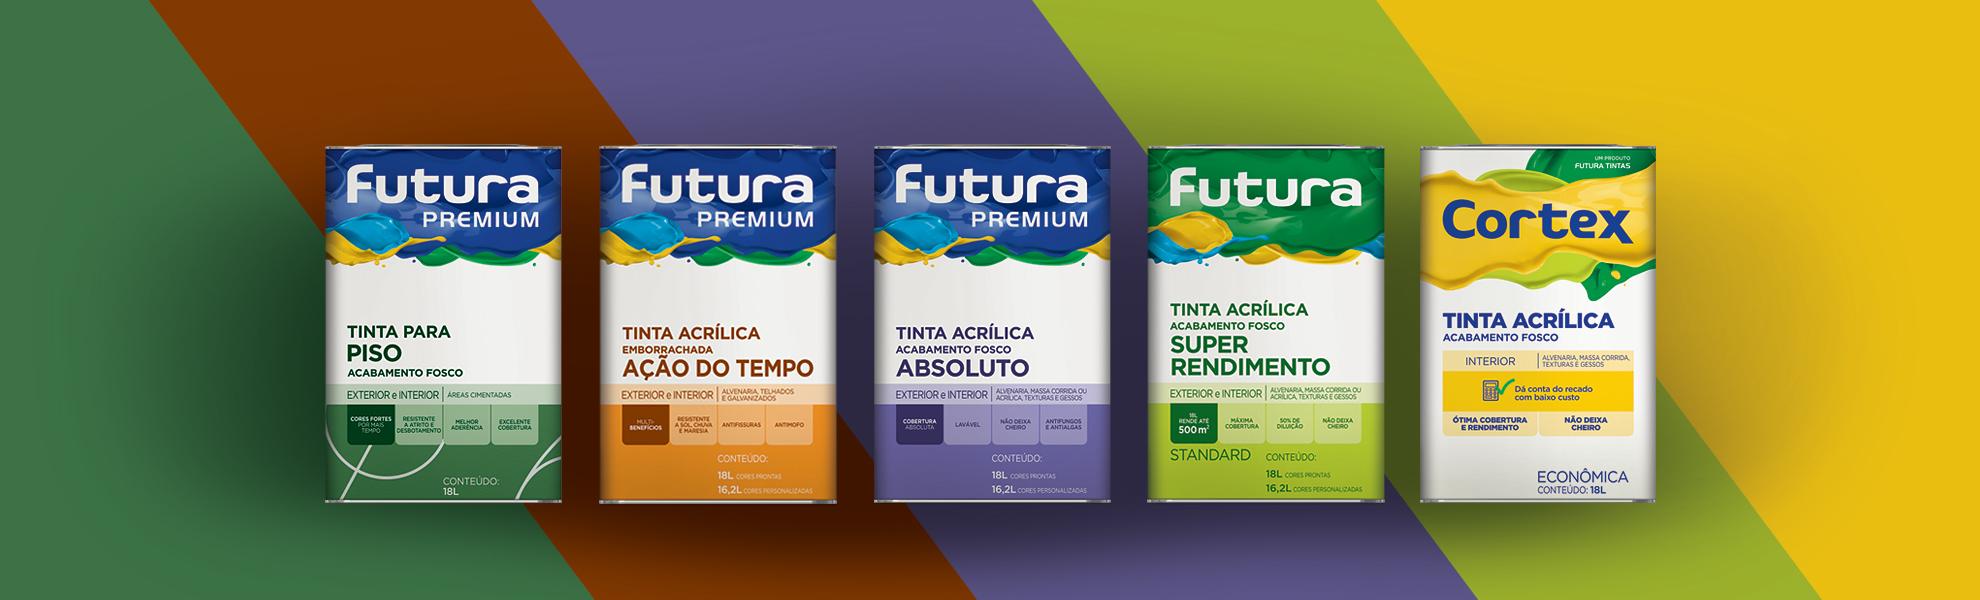 chelles-e-hayashi-design-portfolio-futura-tintas-visual-identity-redesign-2020-packaging-language-graphic-branding